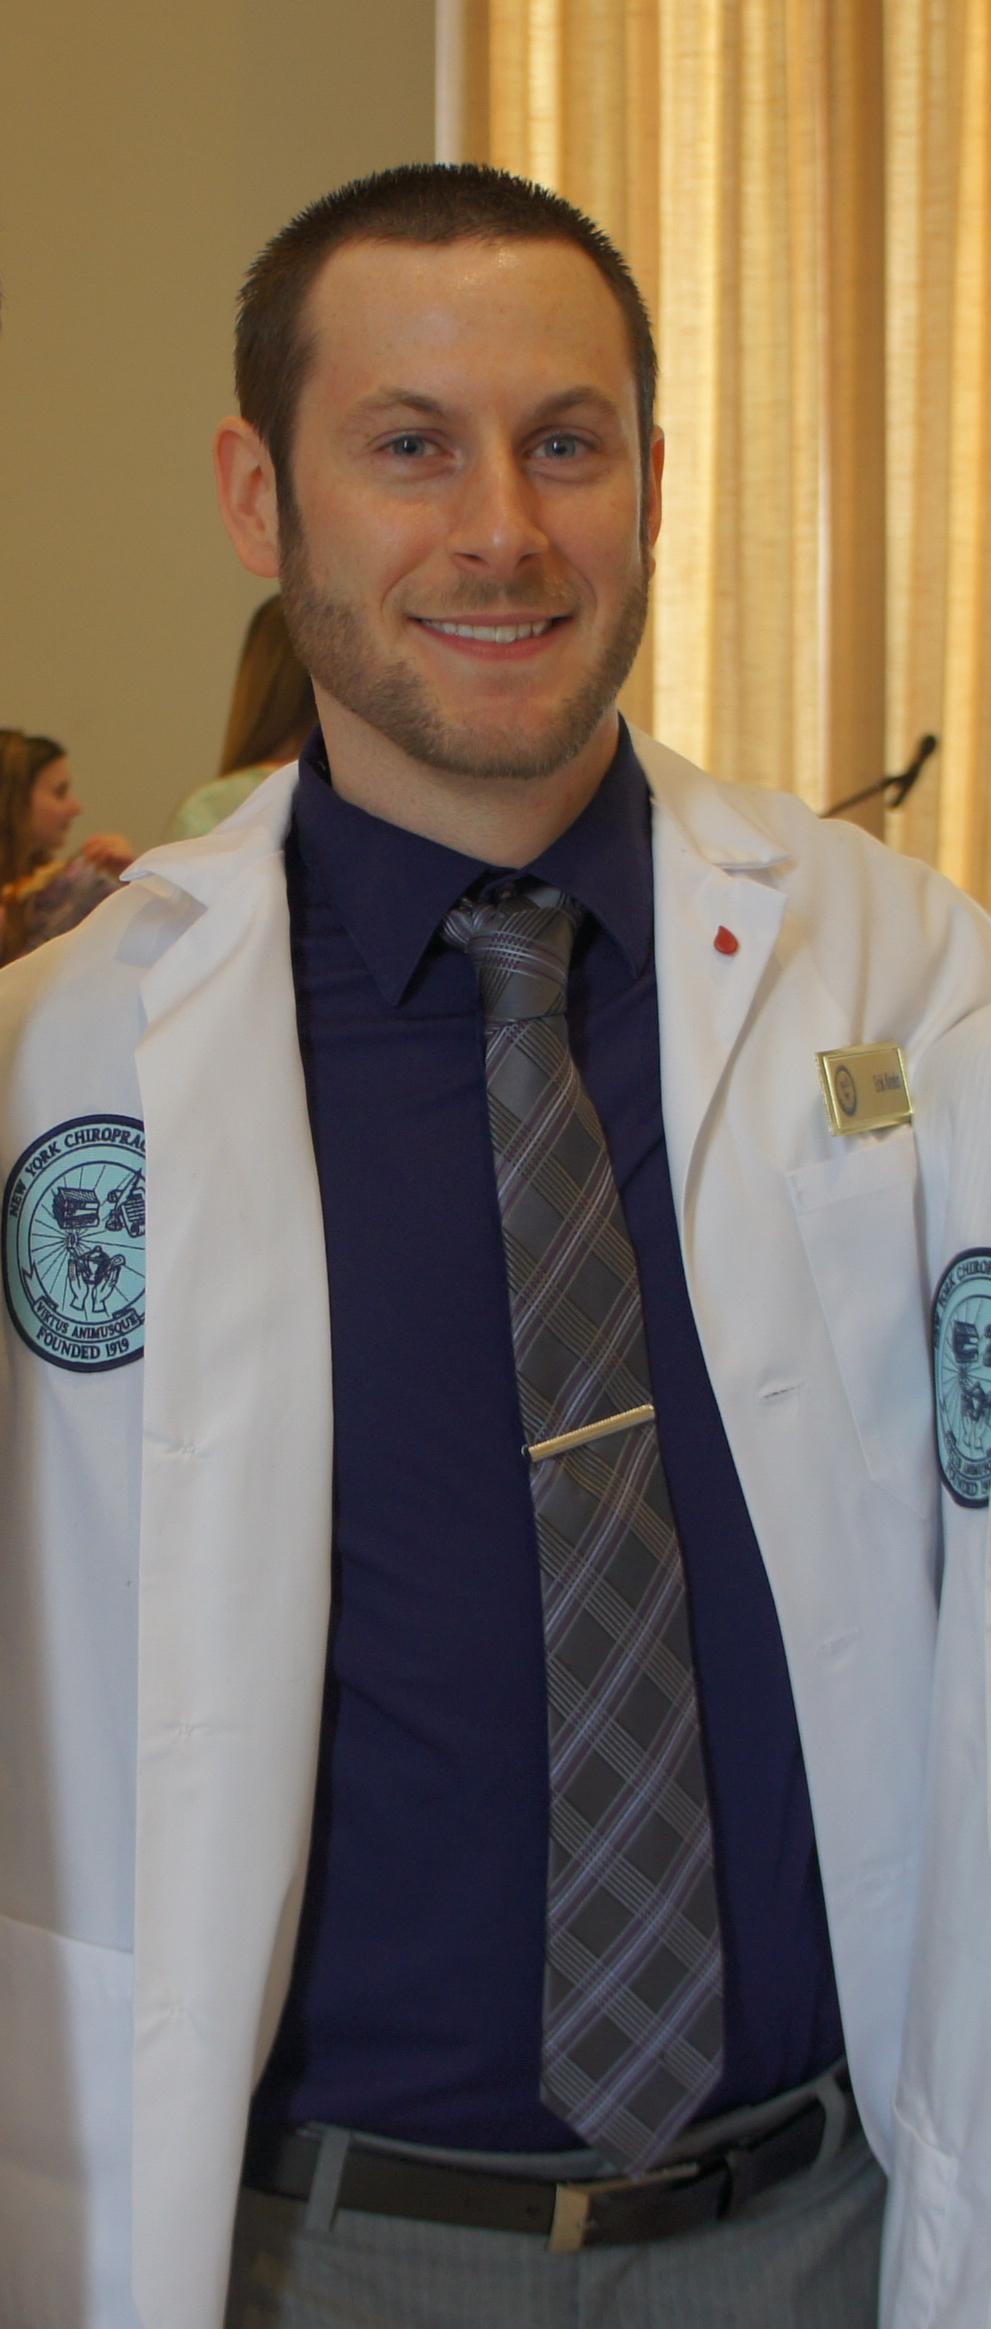 Dr. Erik.JPG